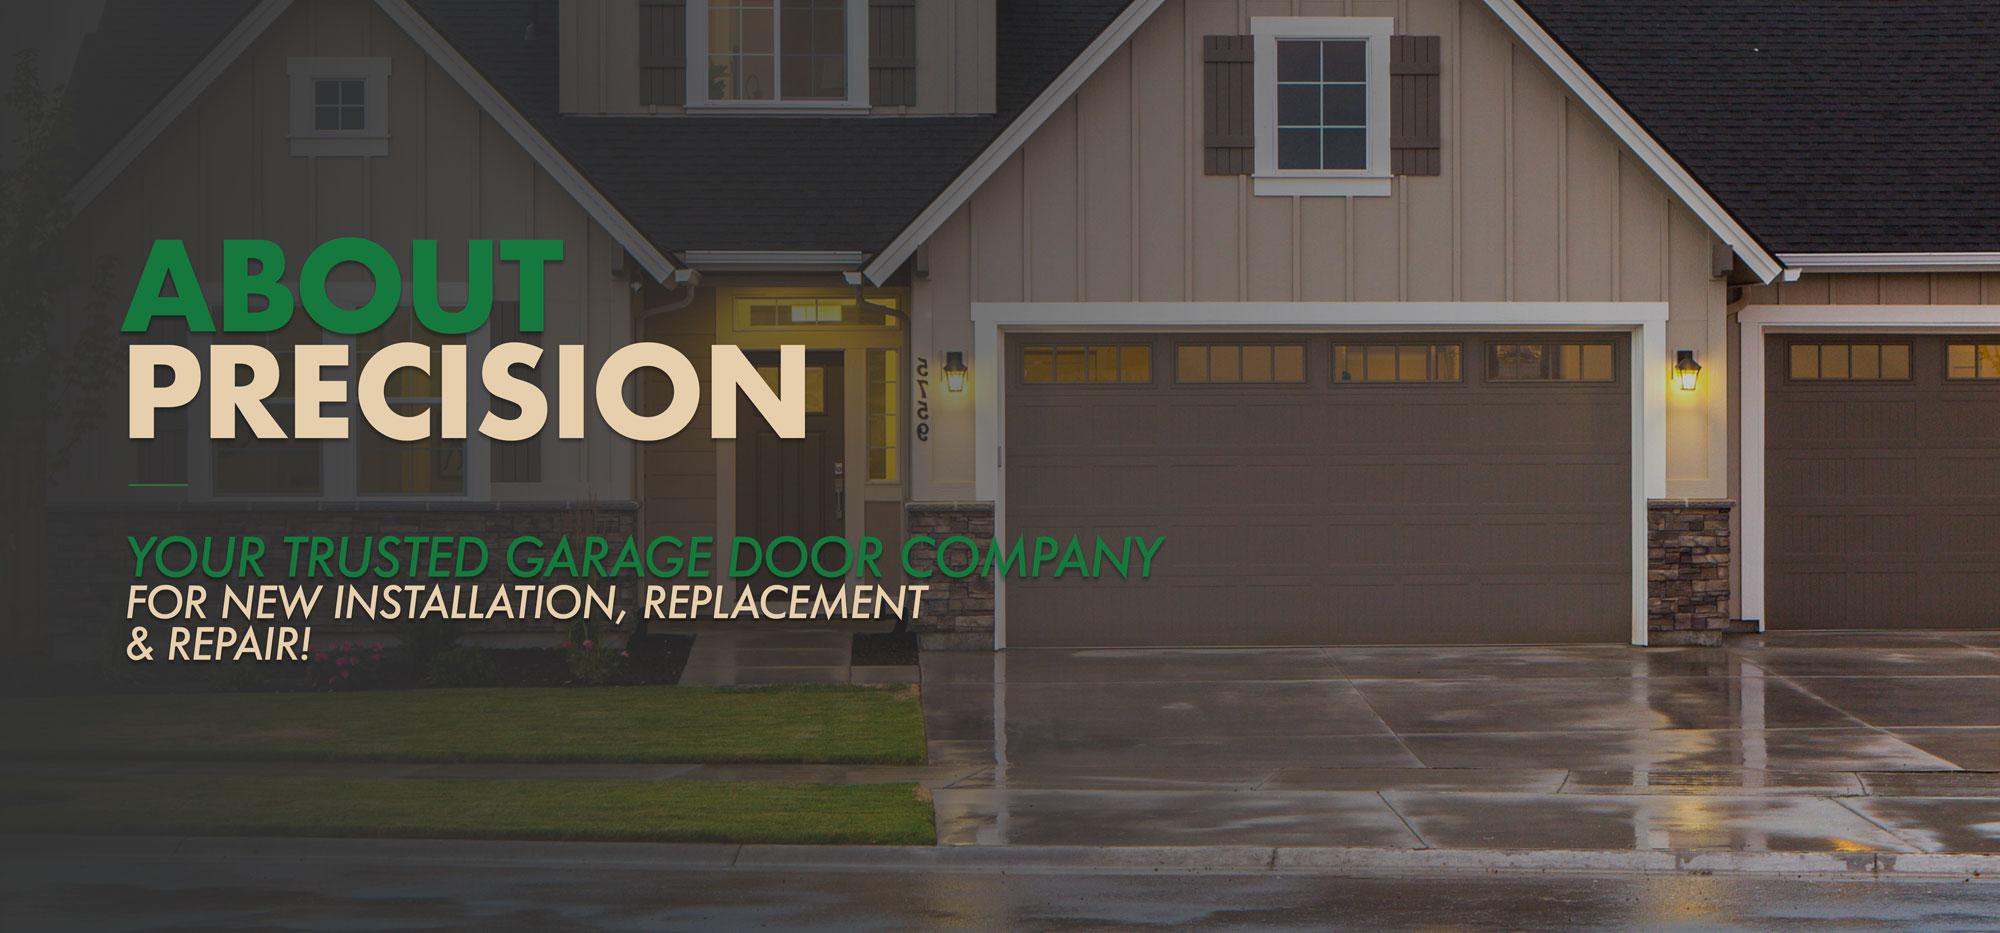 About Precision Door Service Las Vegas